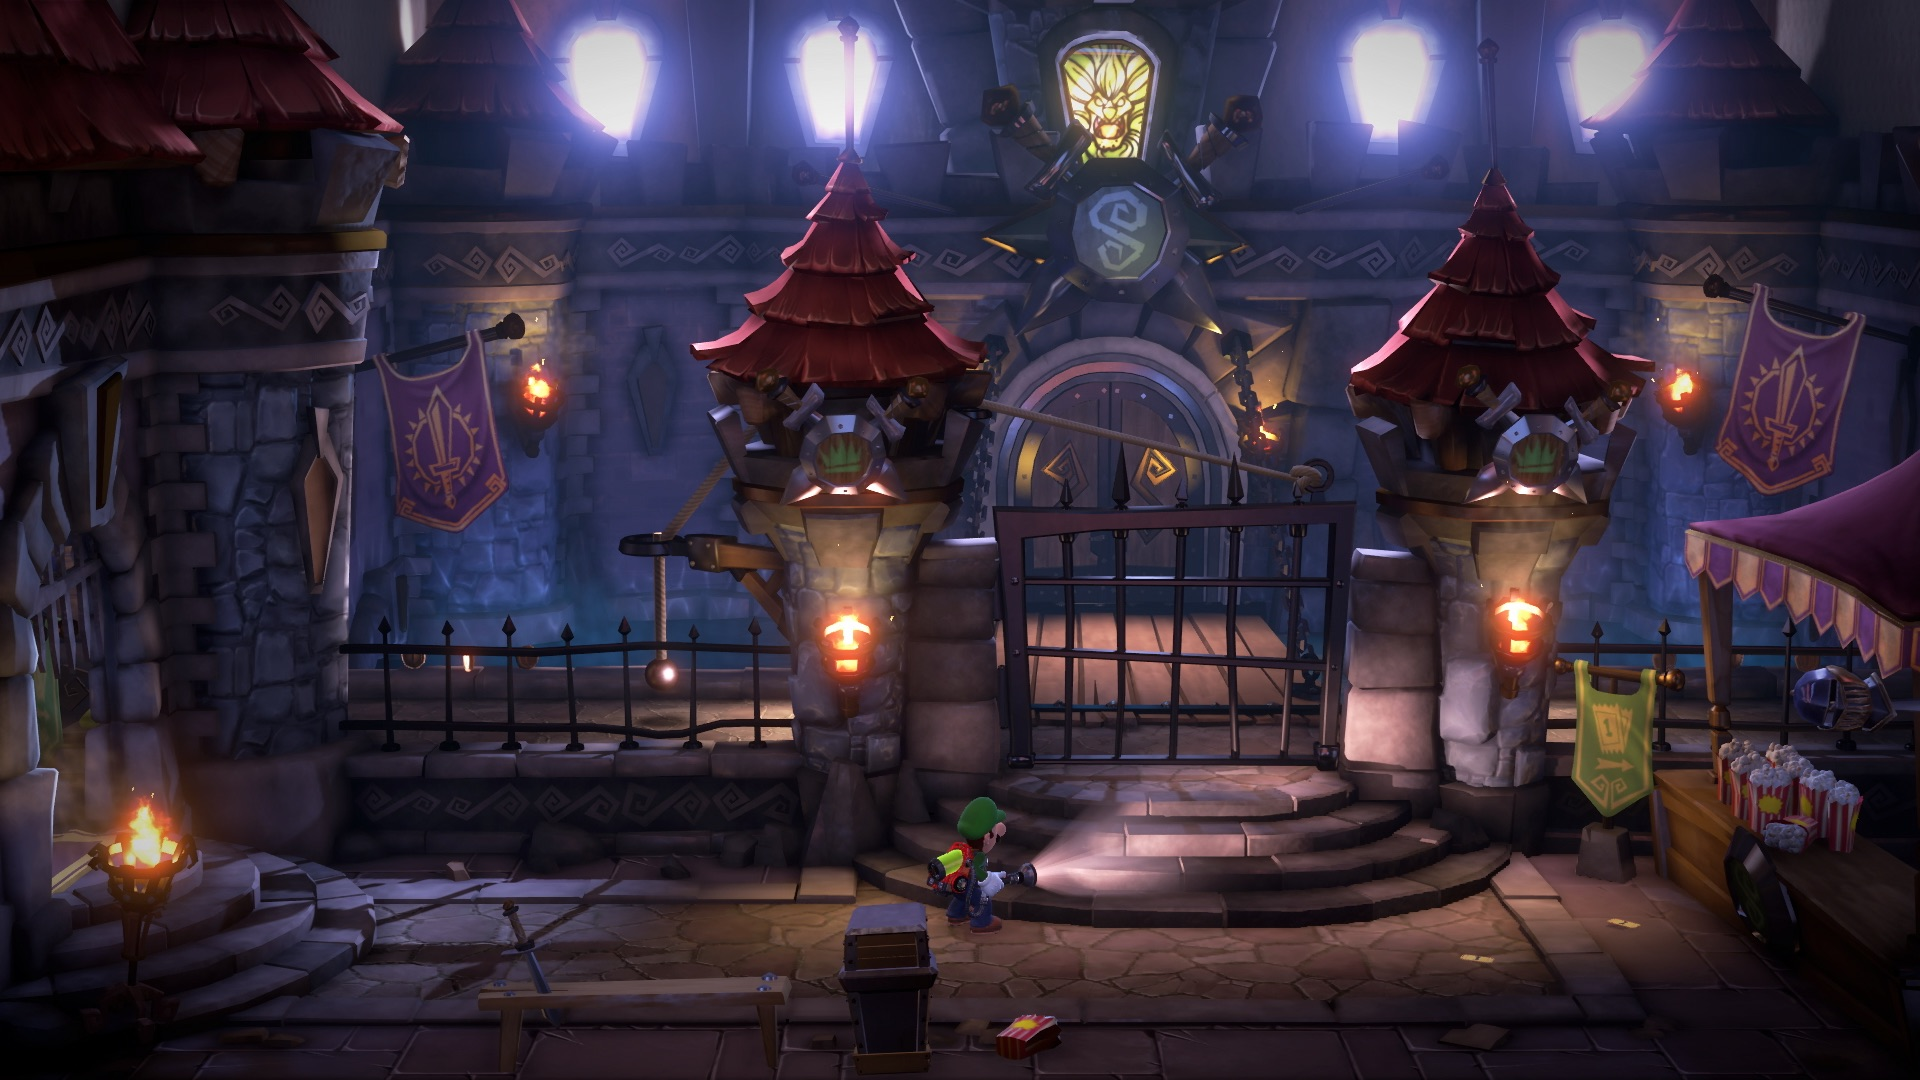 Luigi's Mansion 3 E3 2019 Screenshot 7